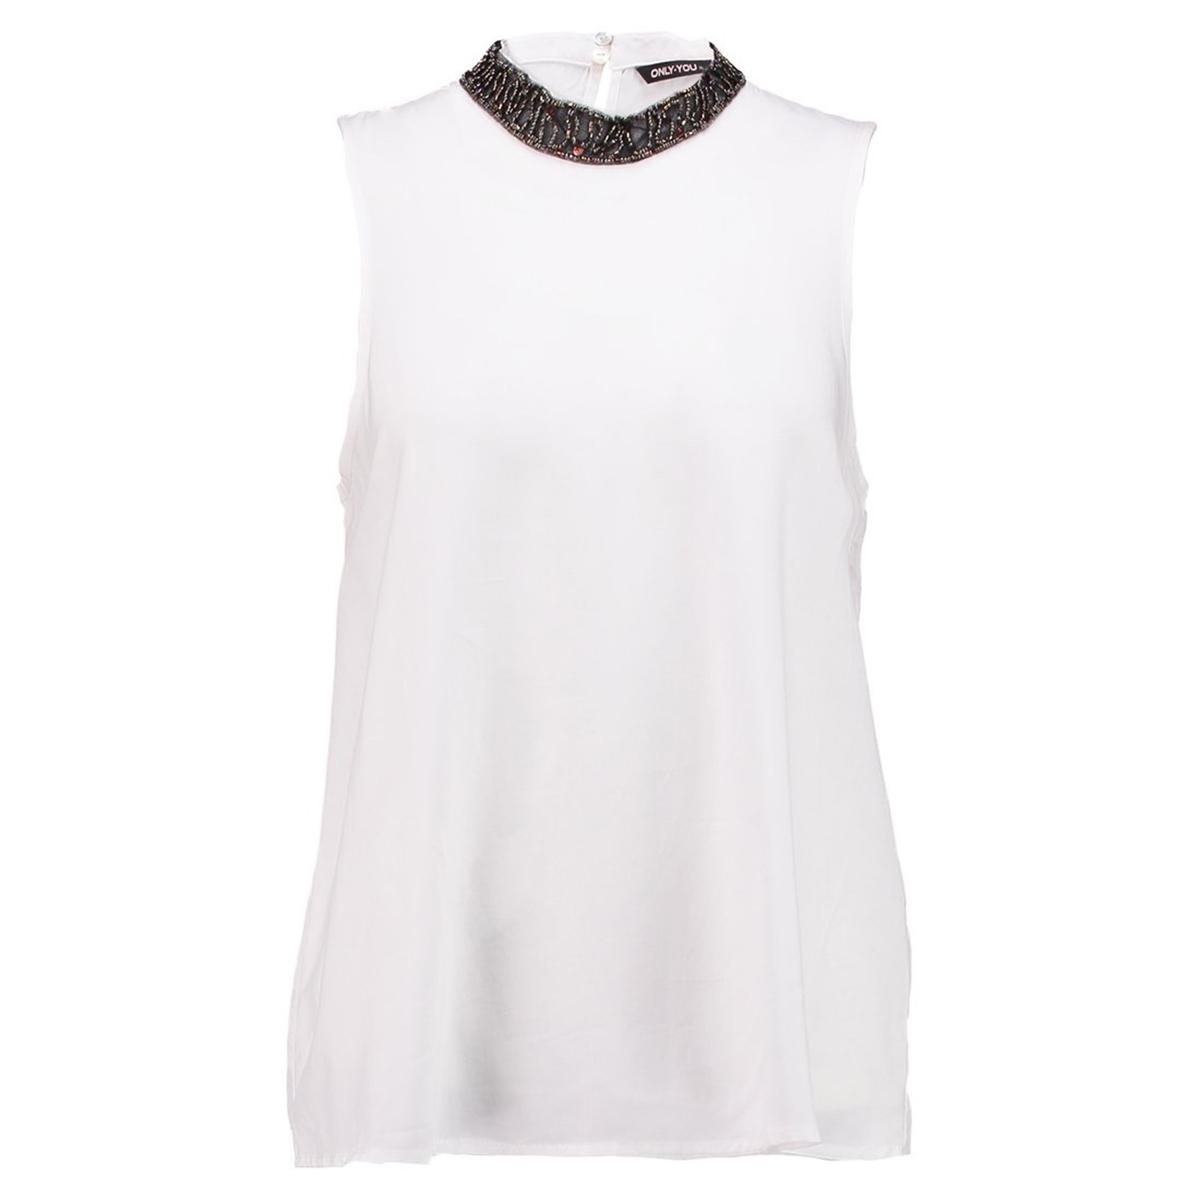 Блузка с круглым вырезом без рукавов блузка однотонная с круглым вырезом без рукавов